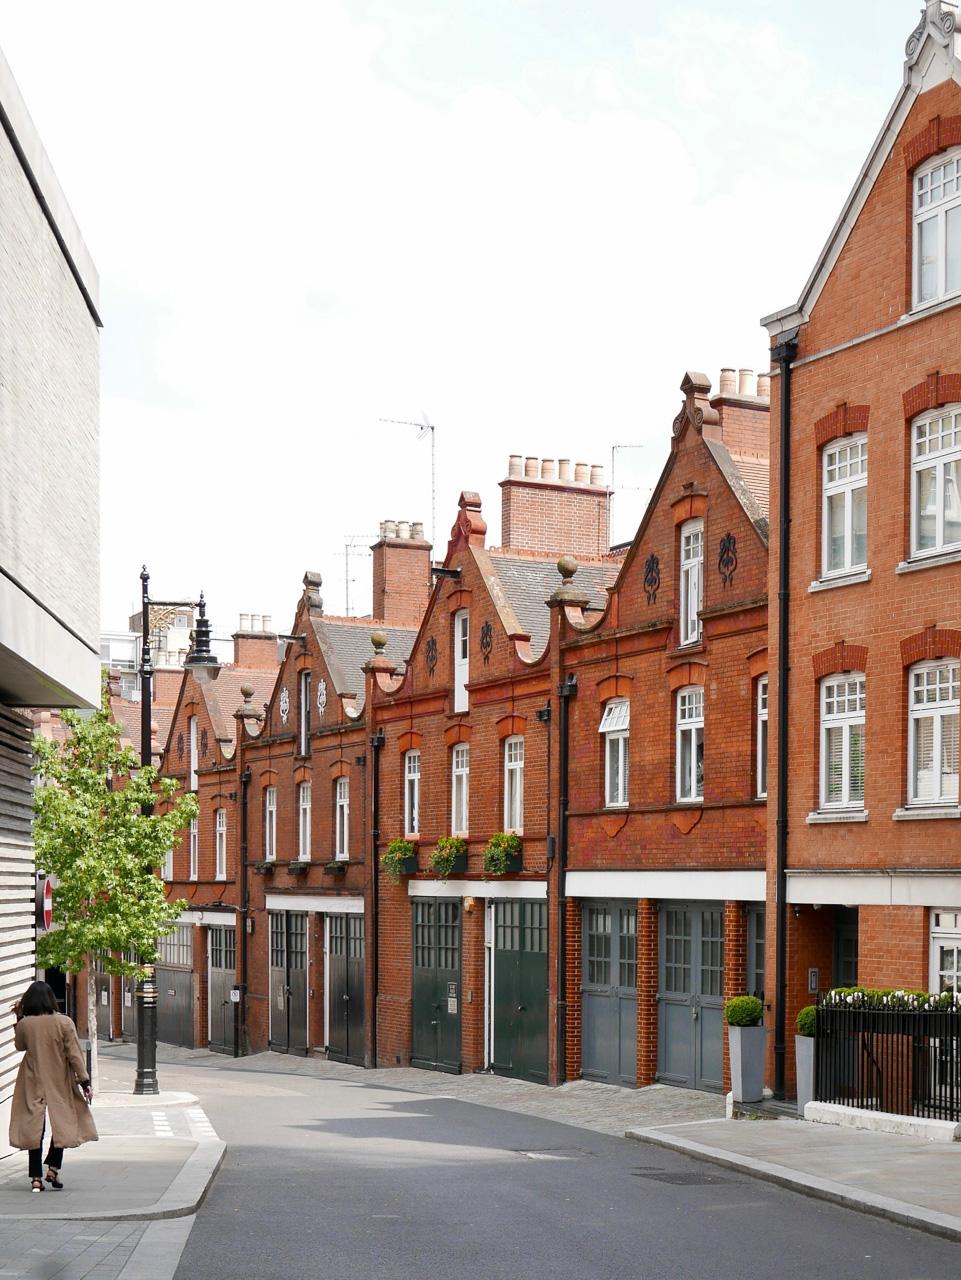 Cara Sharratt Travel - Mews in Mayfair - London, England